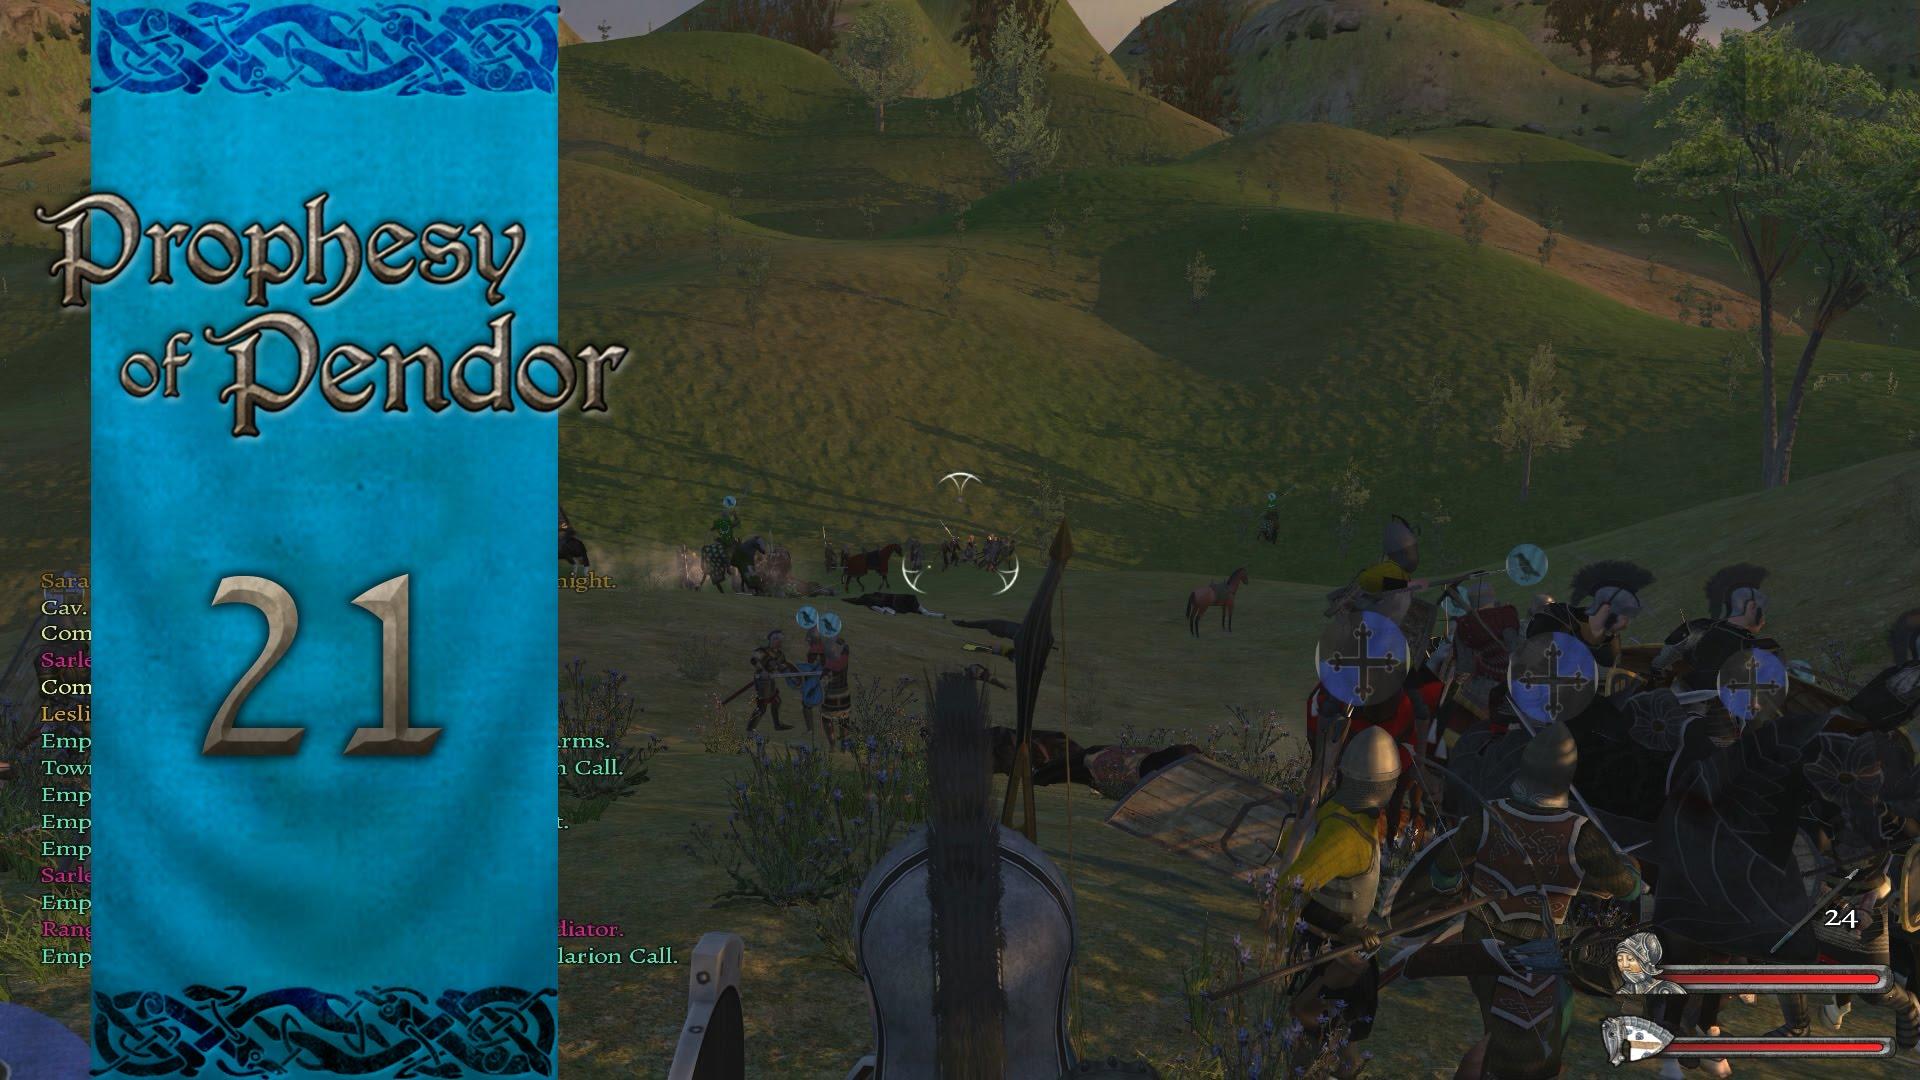 Cheats | Mount and Blade Wiki | FANDOM powered by Wikia